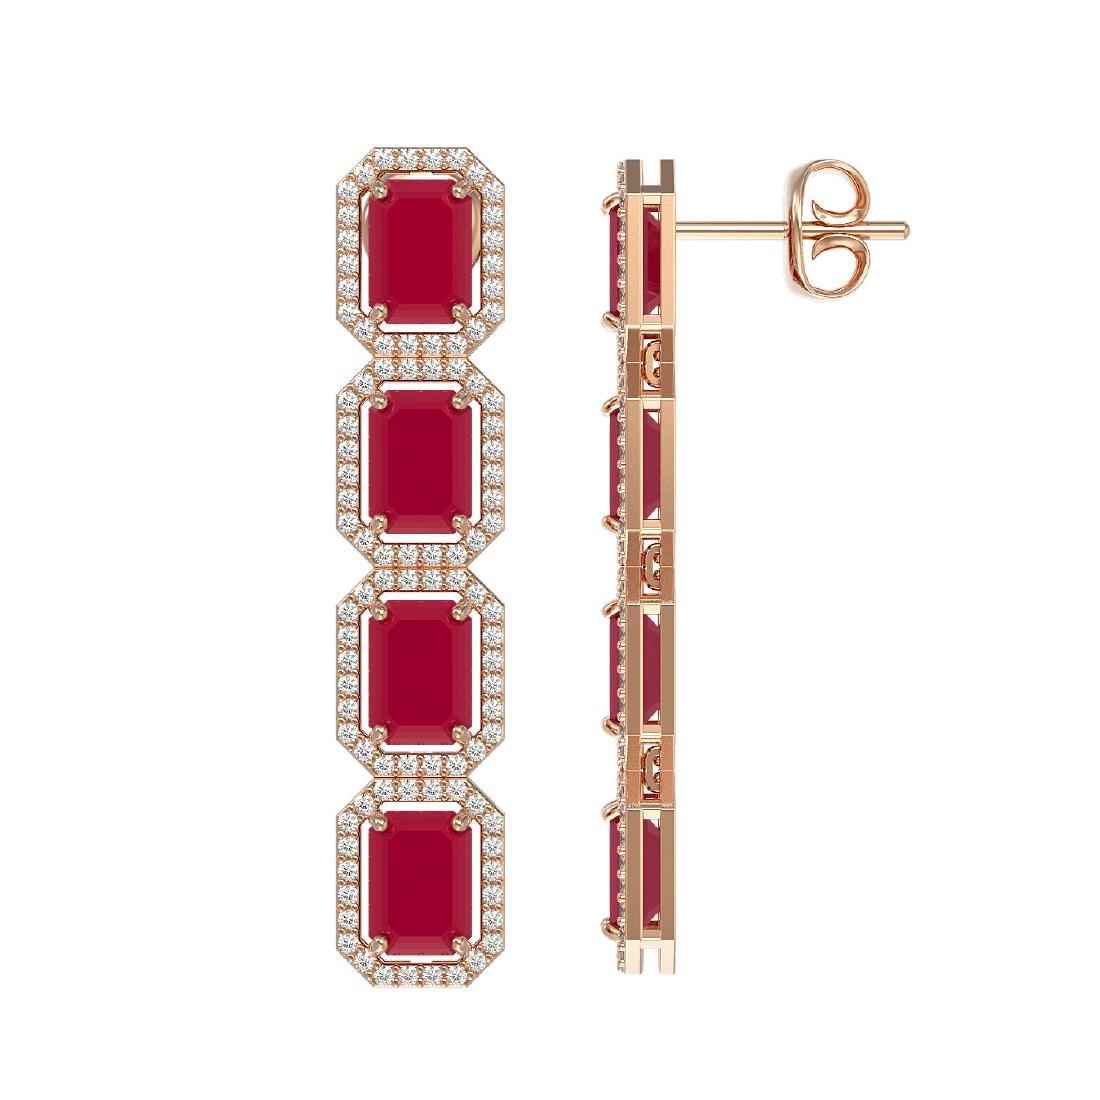 12.33 CTW Ruby & Diamond Halo Earrings 10K Rose Gold - 2